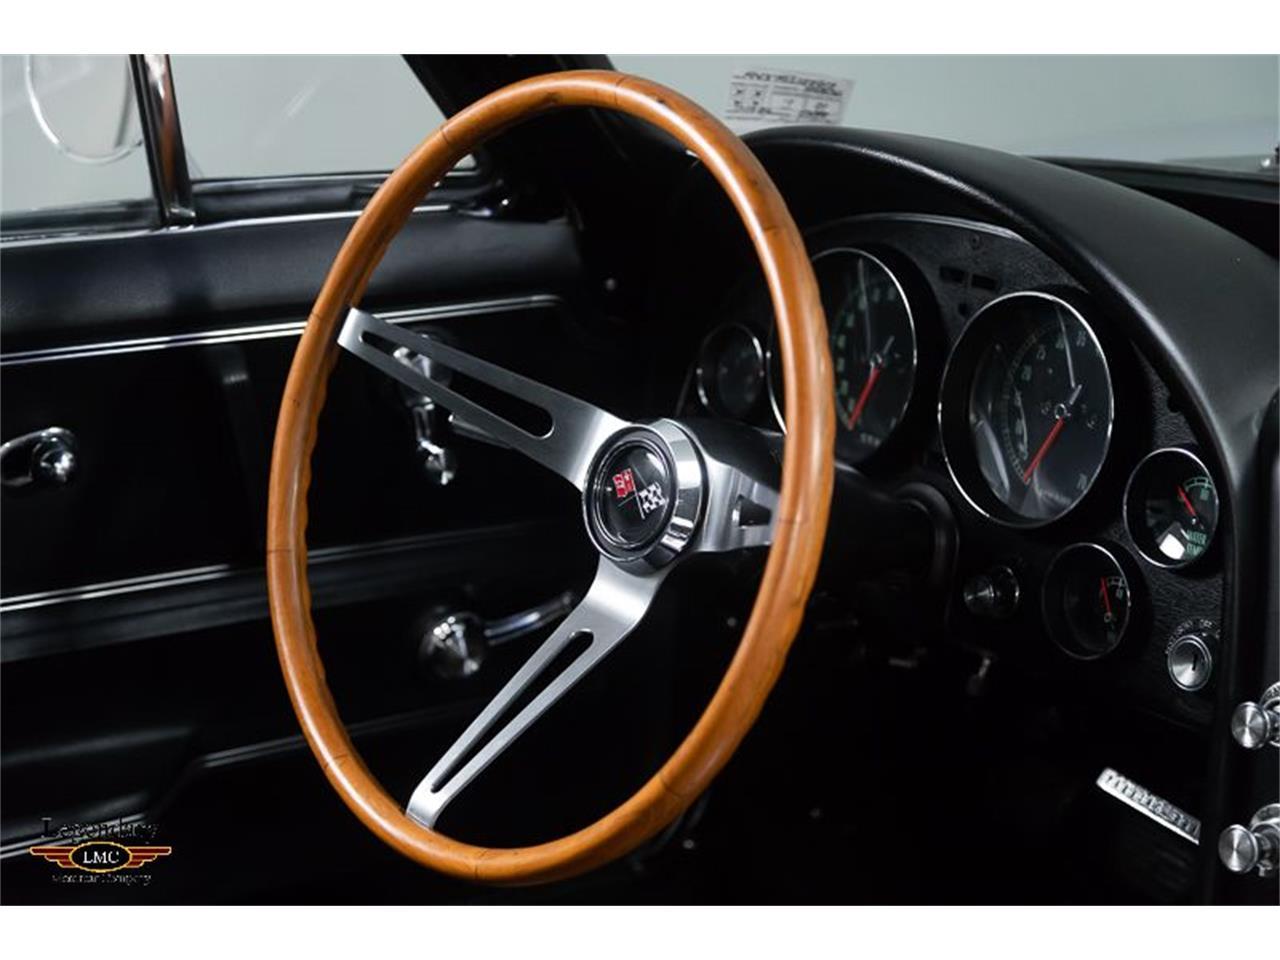 1965 Chevrolet Corvette Stingray (CC-1417108) for sale in Halton Hills, Ontario